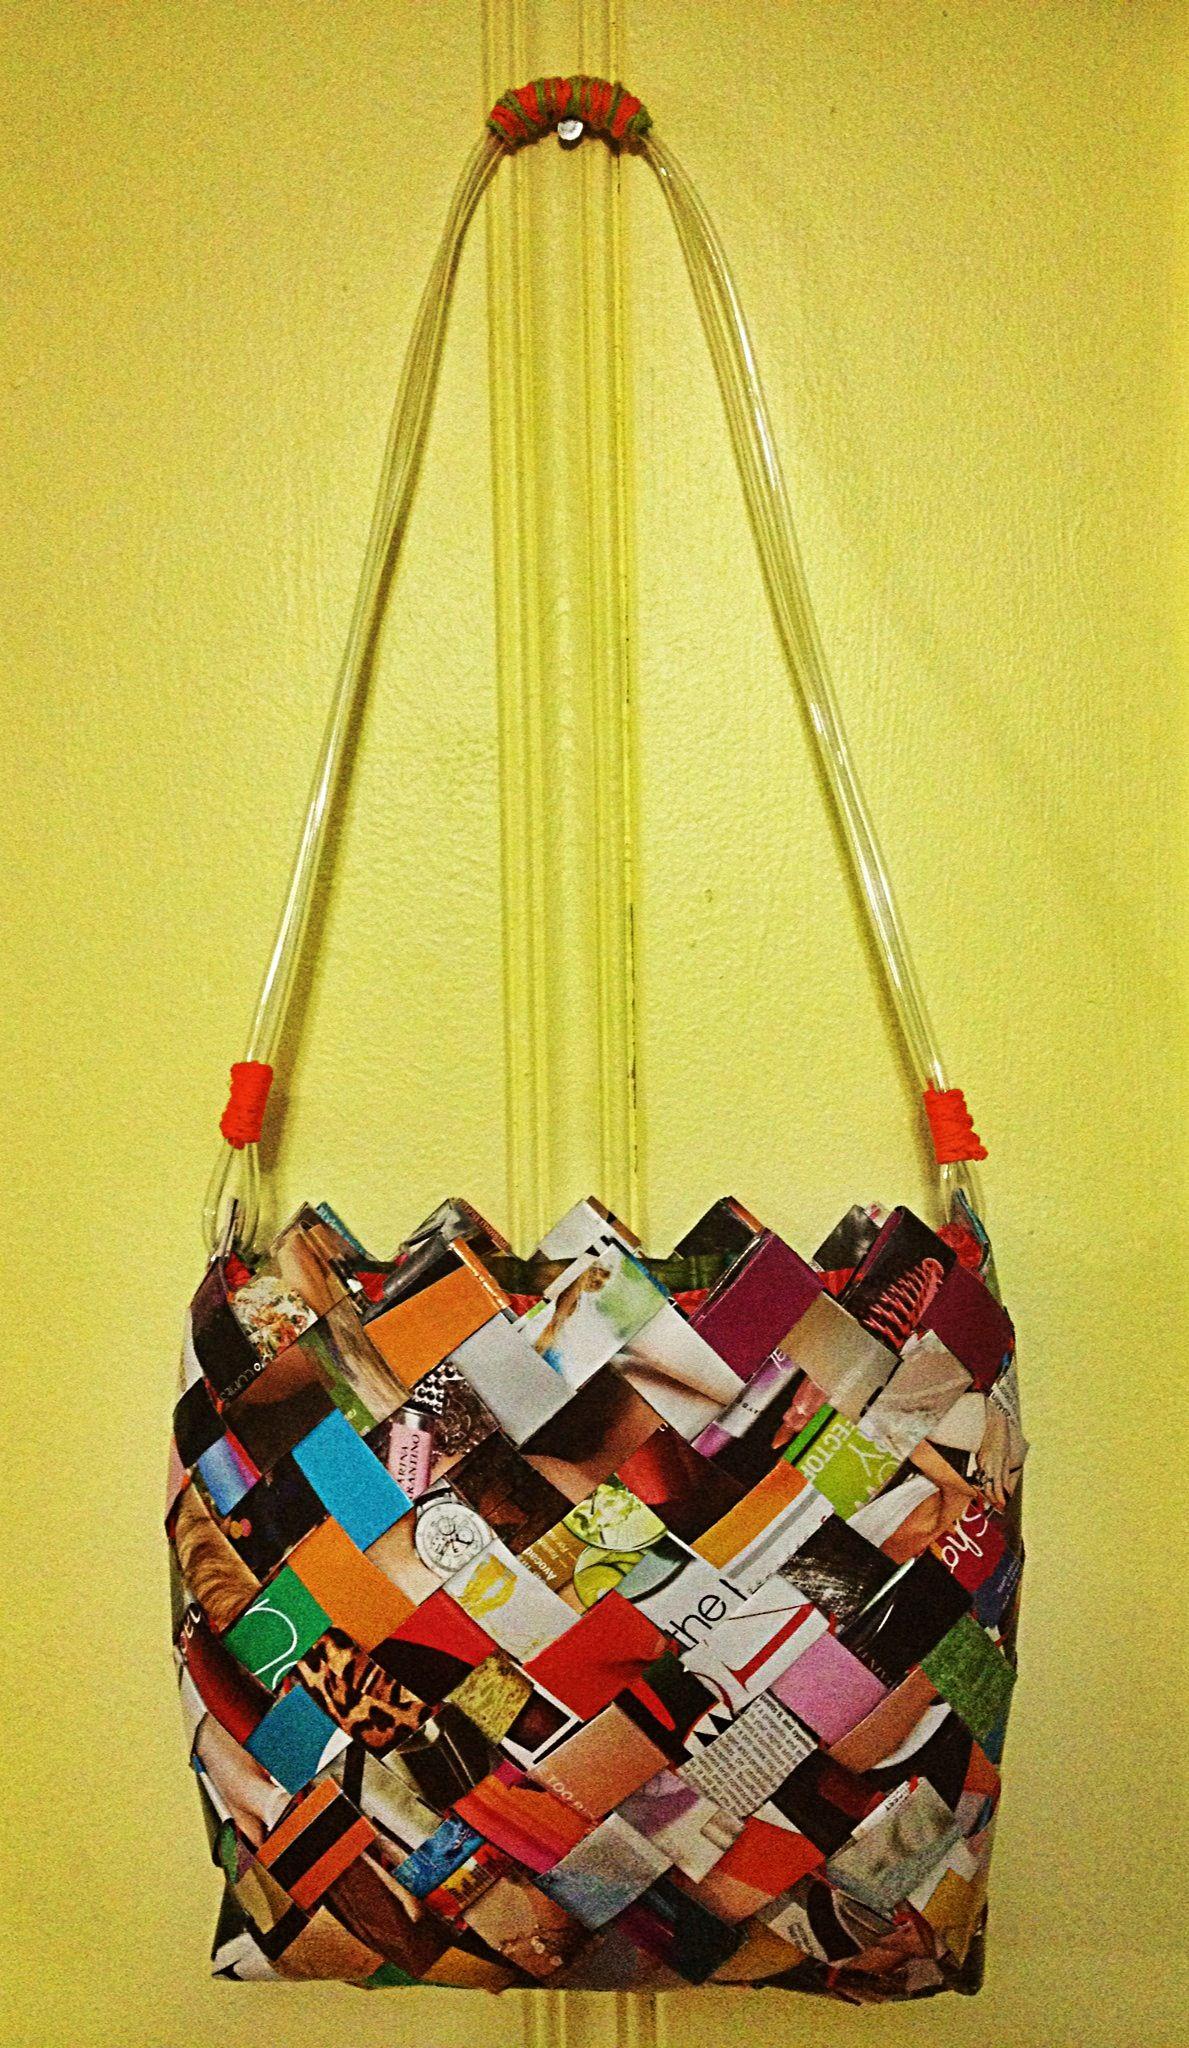 Woven Magazine Purse Paper Candy Bags Handmade Newspaper Weaving